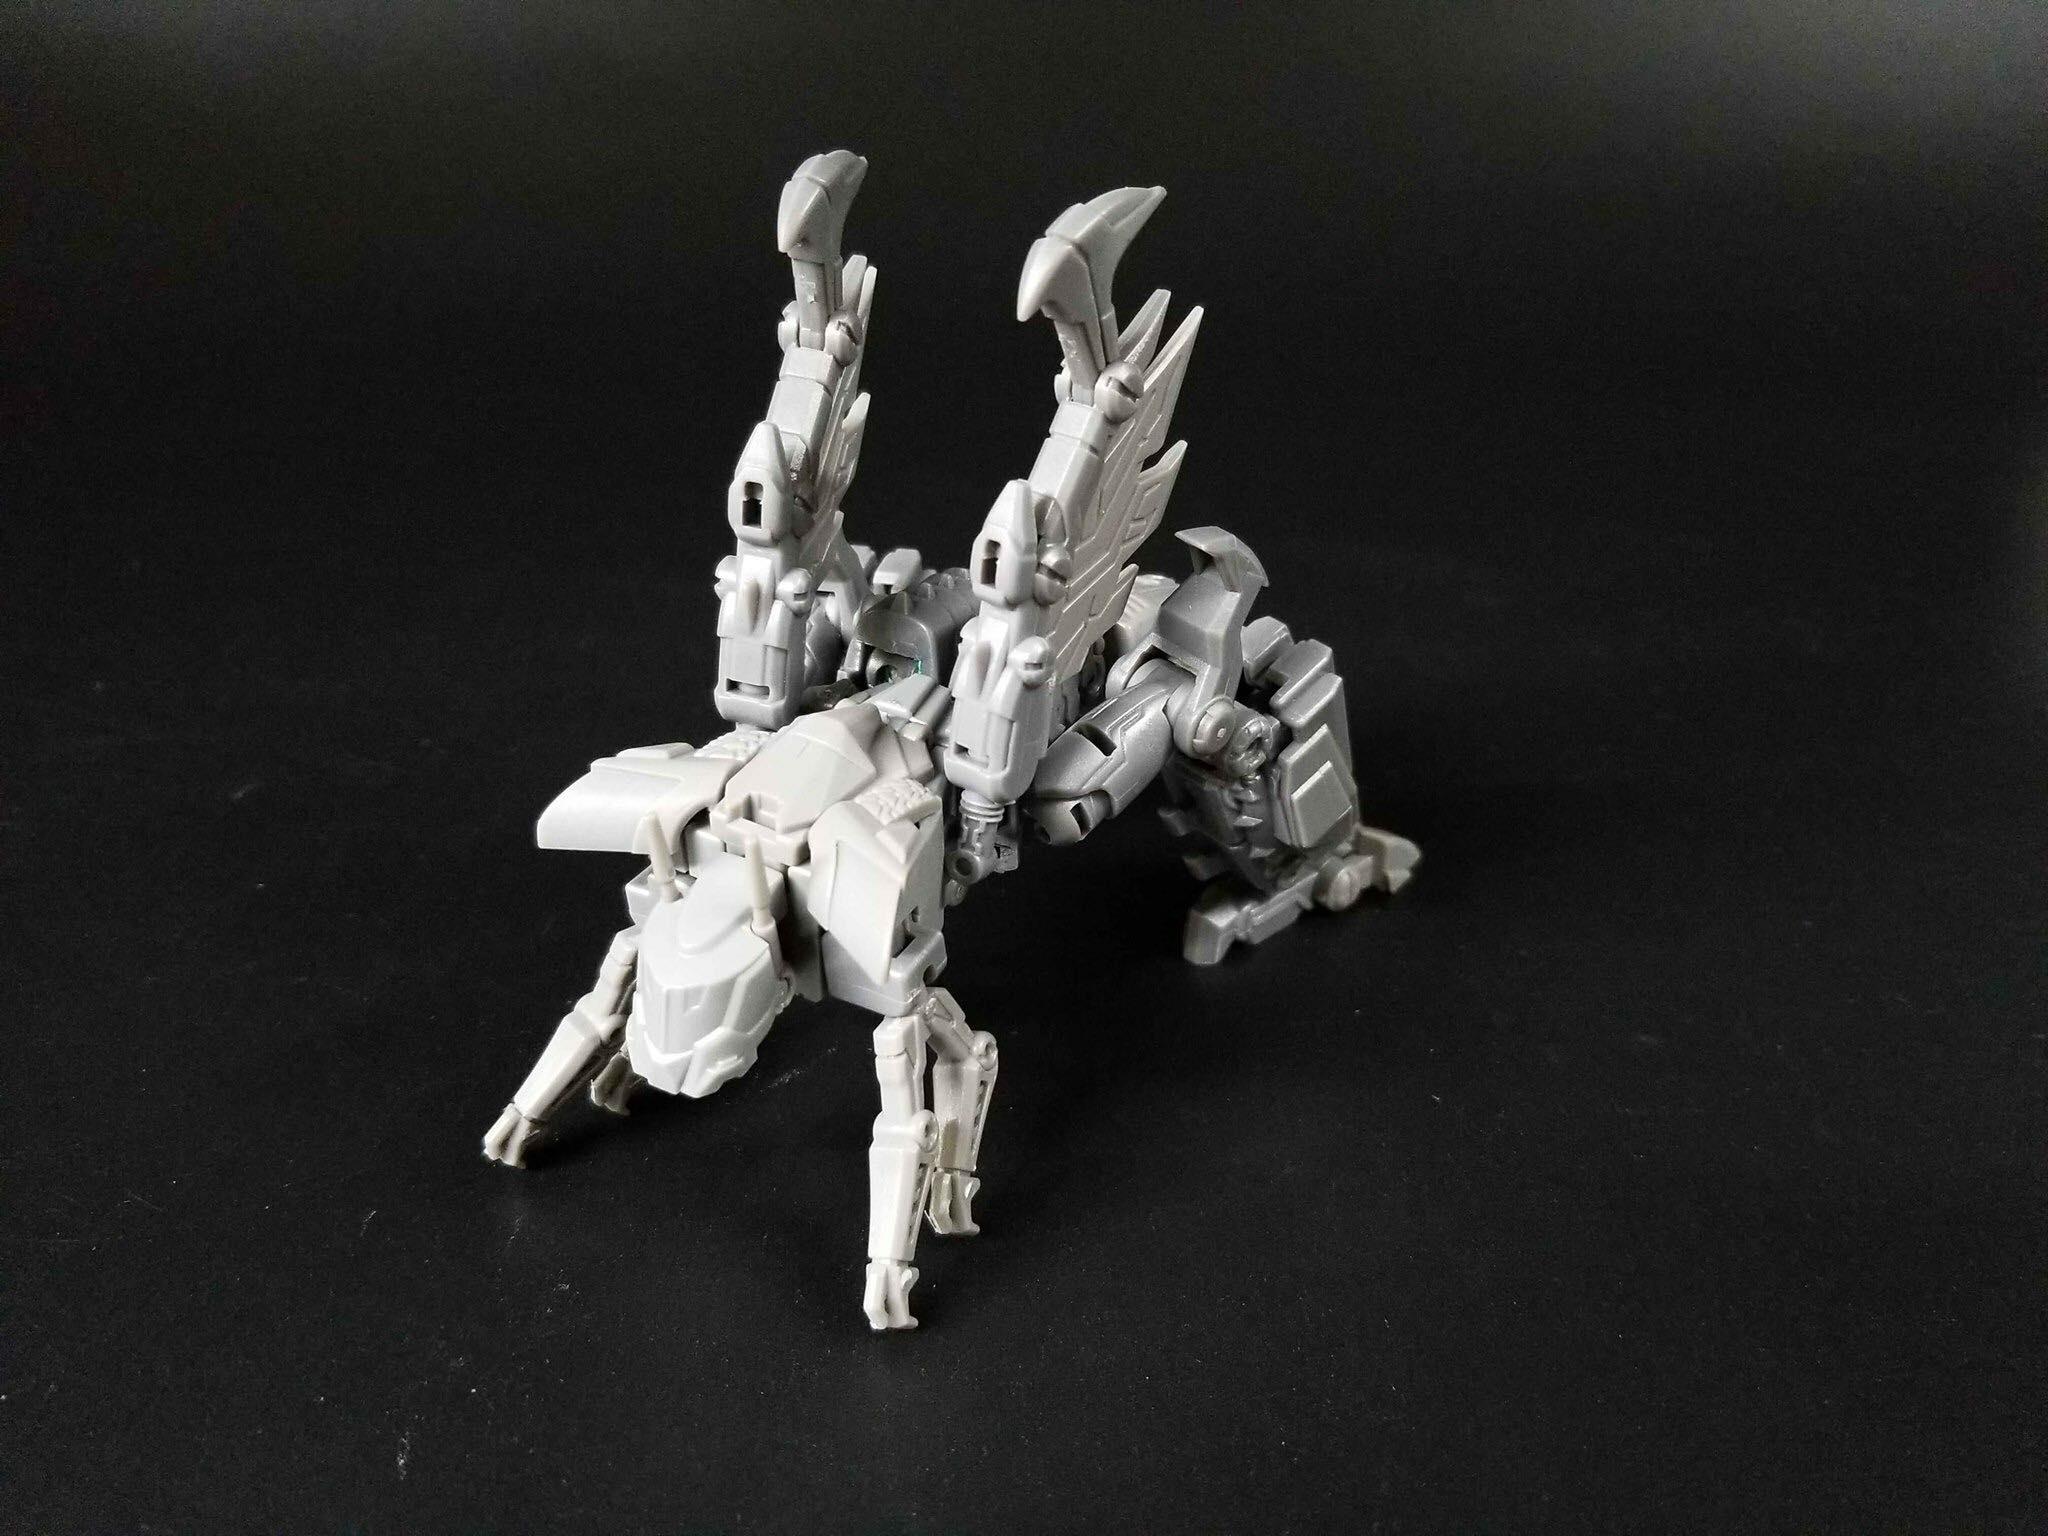 [Planet X] Produit Tiers - Jouets TF de la gamme PX (Fall of Cybertron) - Page 12 JkE3oqoA_o